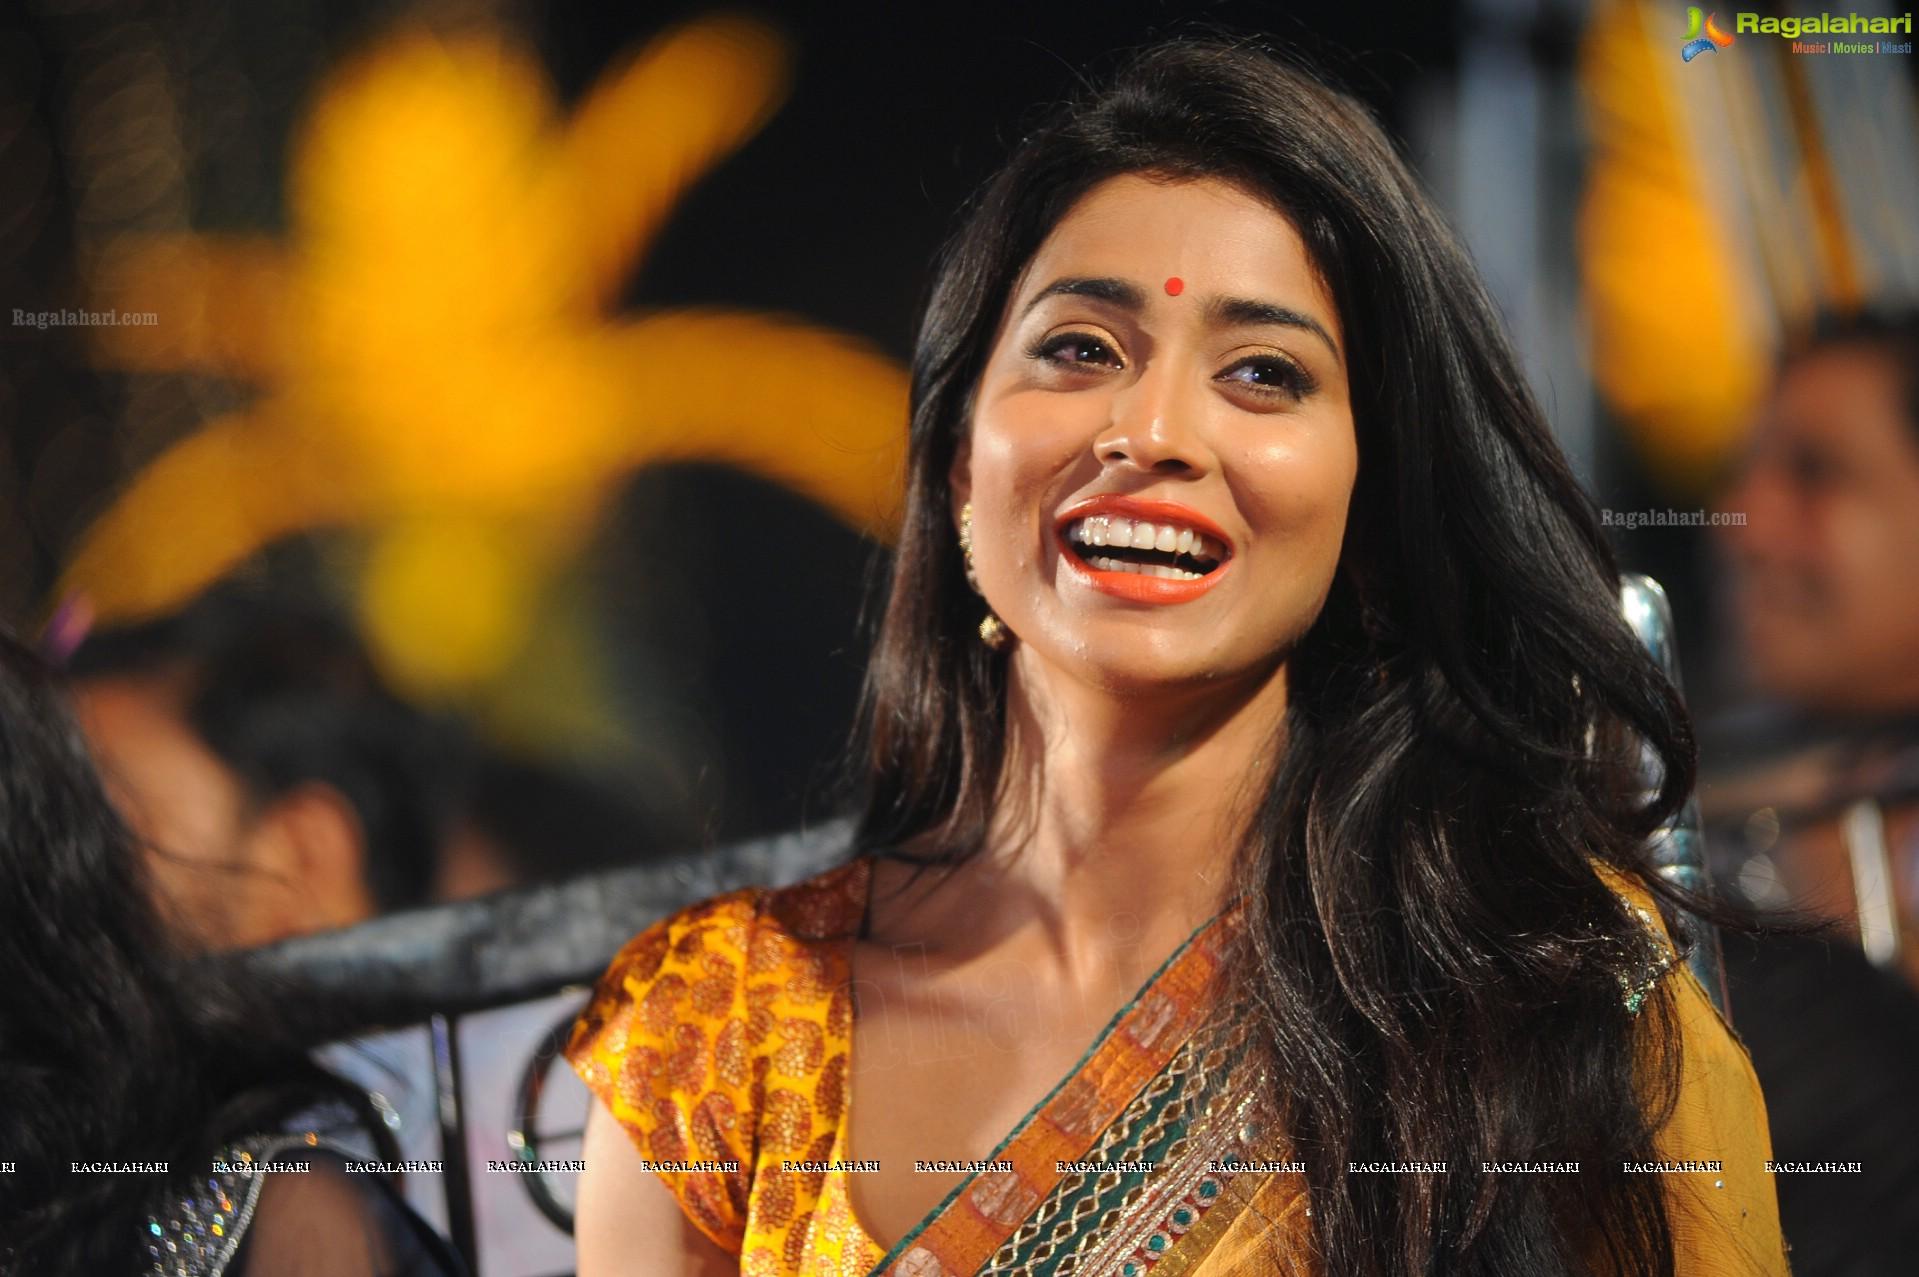 Shriya Saran High Resolution Images: Beautiful Tollywood Actress